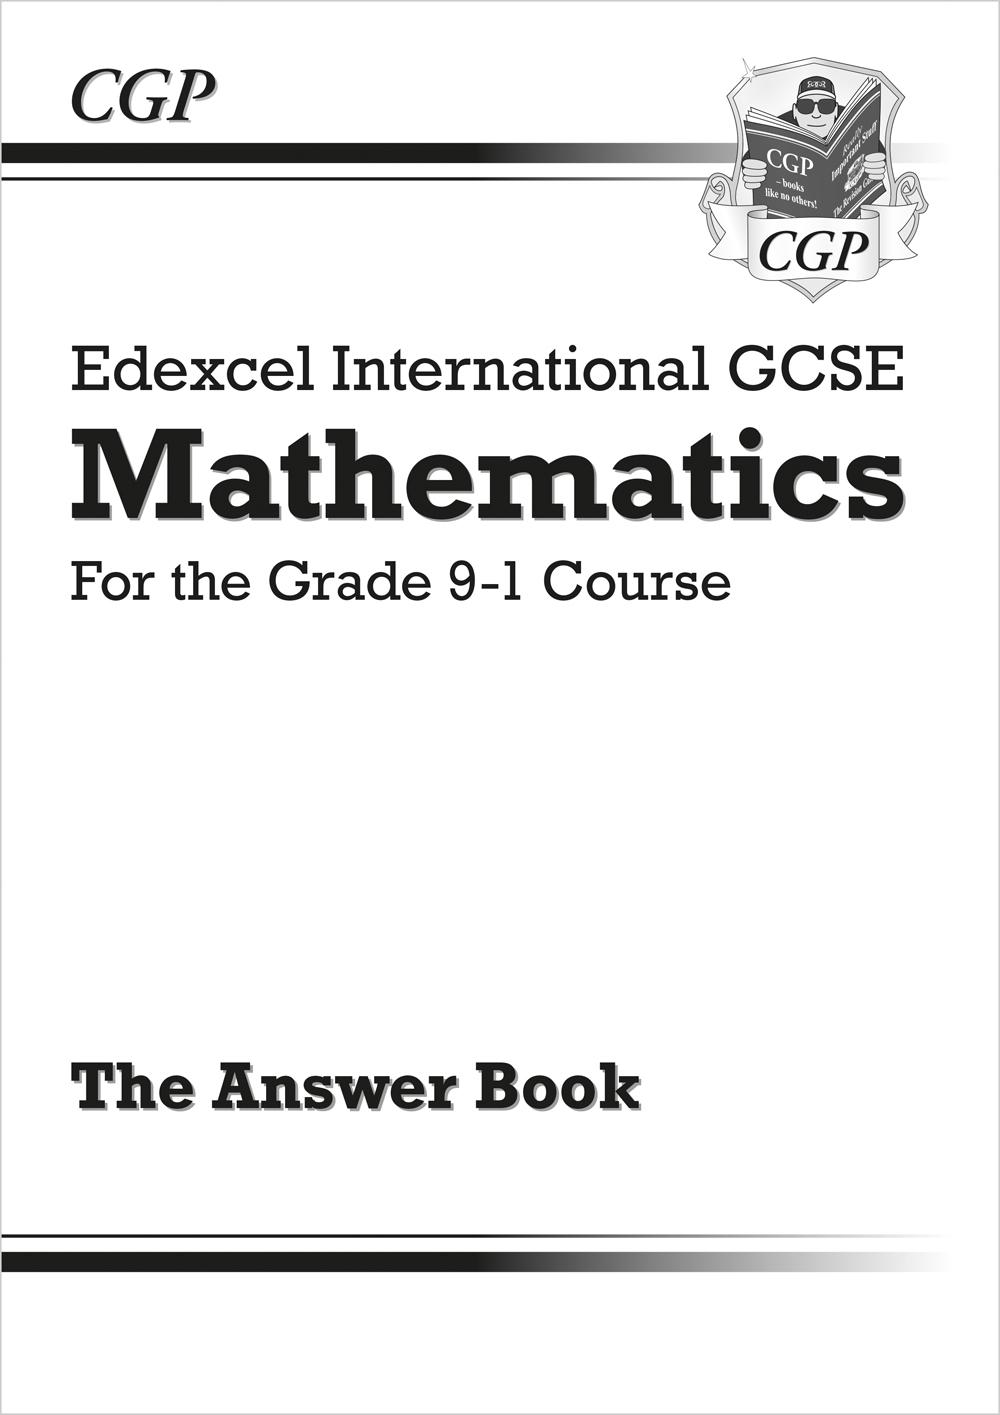 Edexcel International GCSE Maths Answers for Workbook